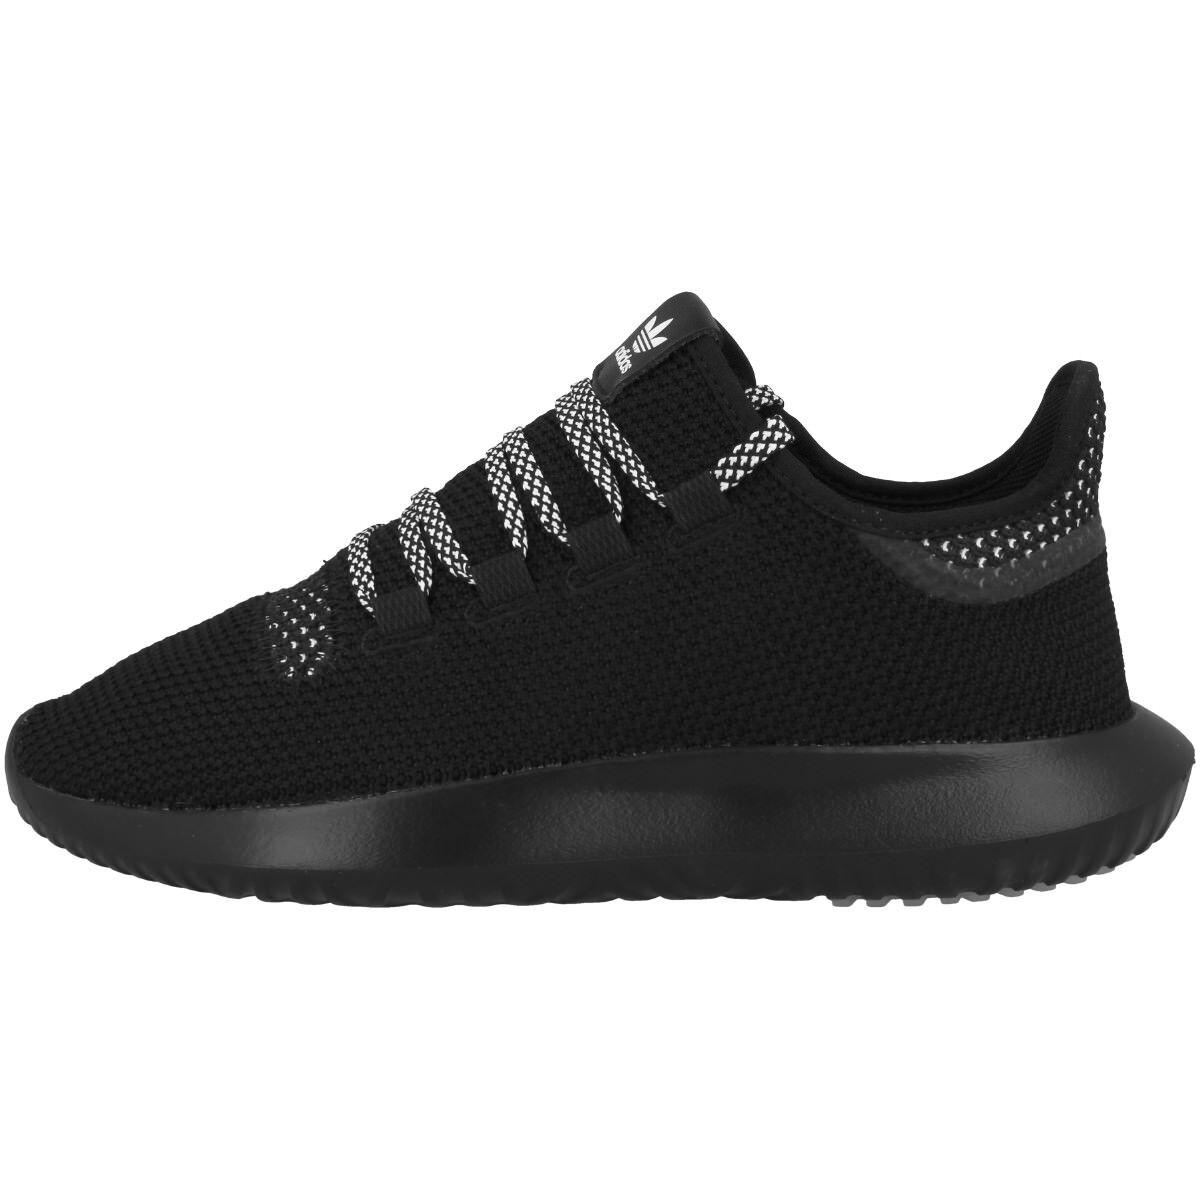 Adidas Tubular Shadow CK Men Schuhe Herren Sneaker Laufschuhe black white CQ0930